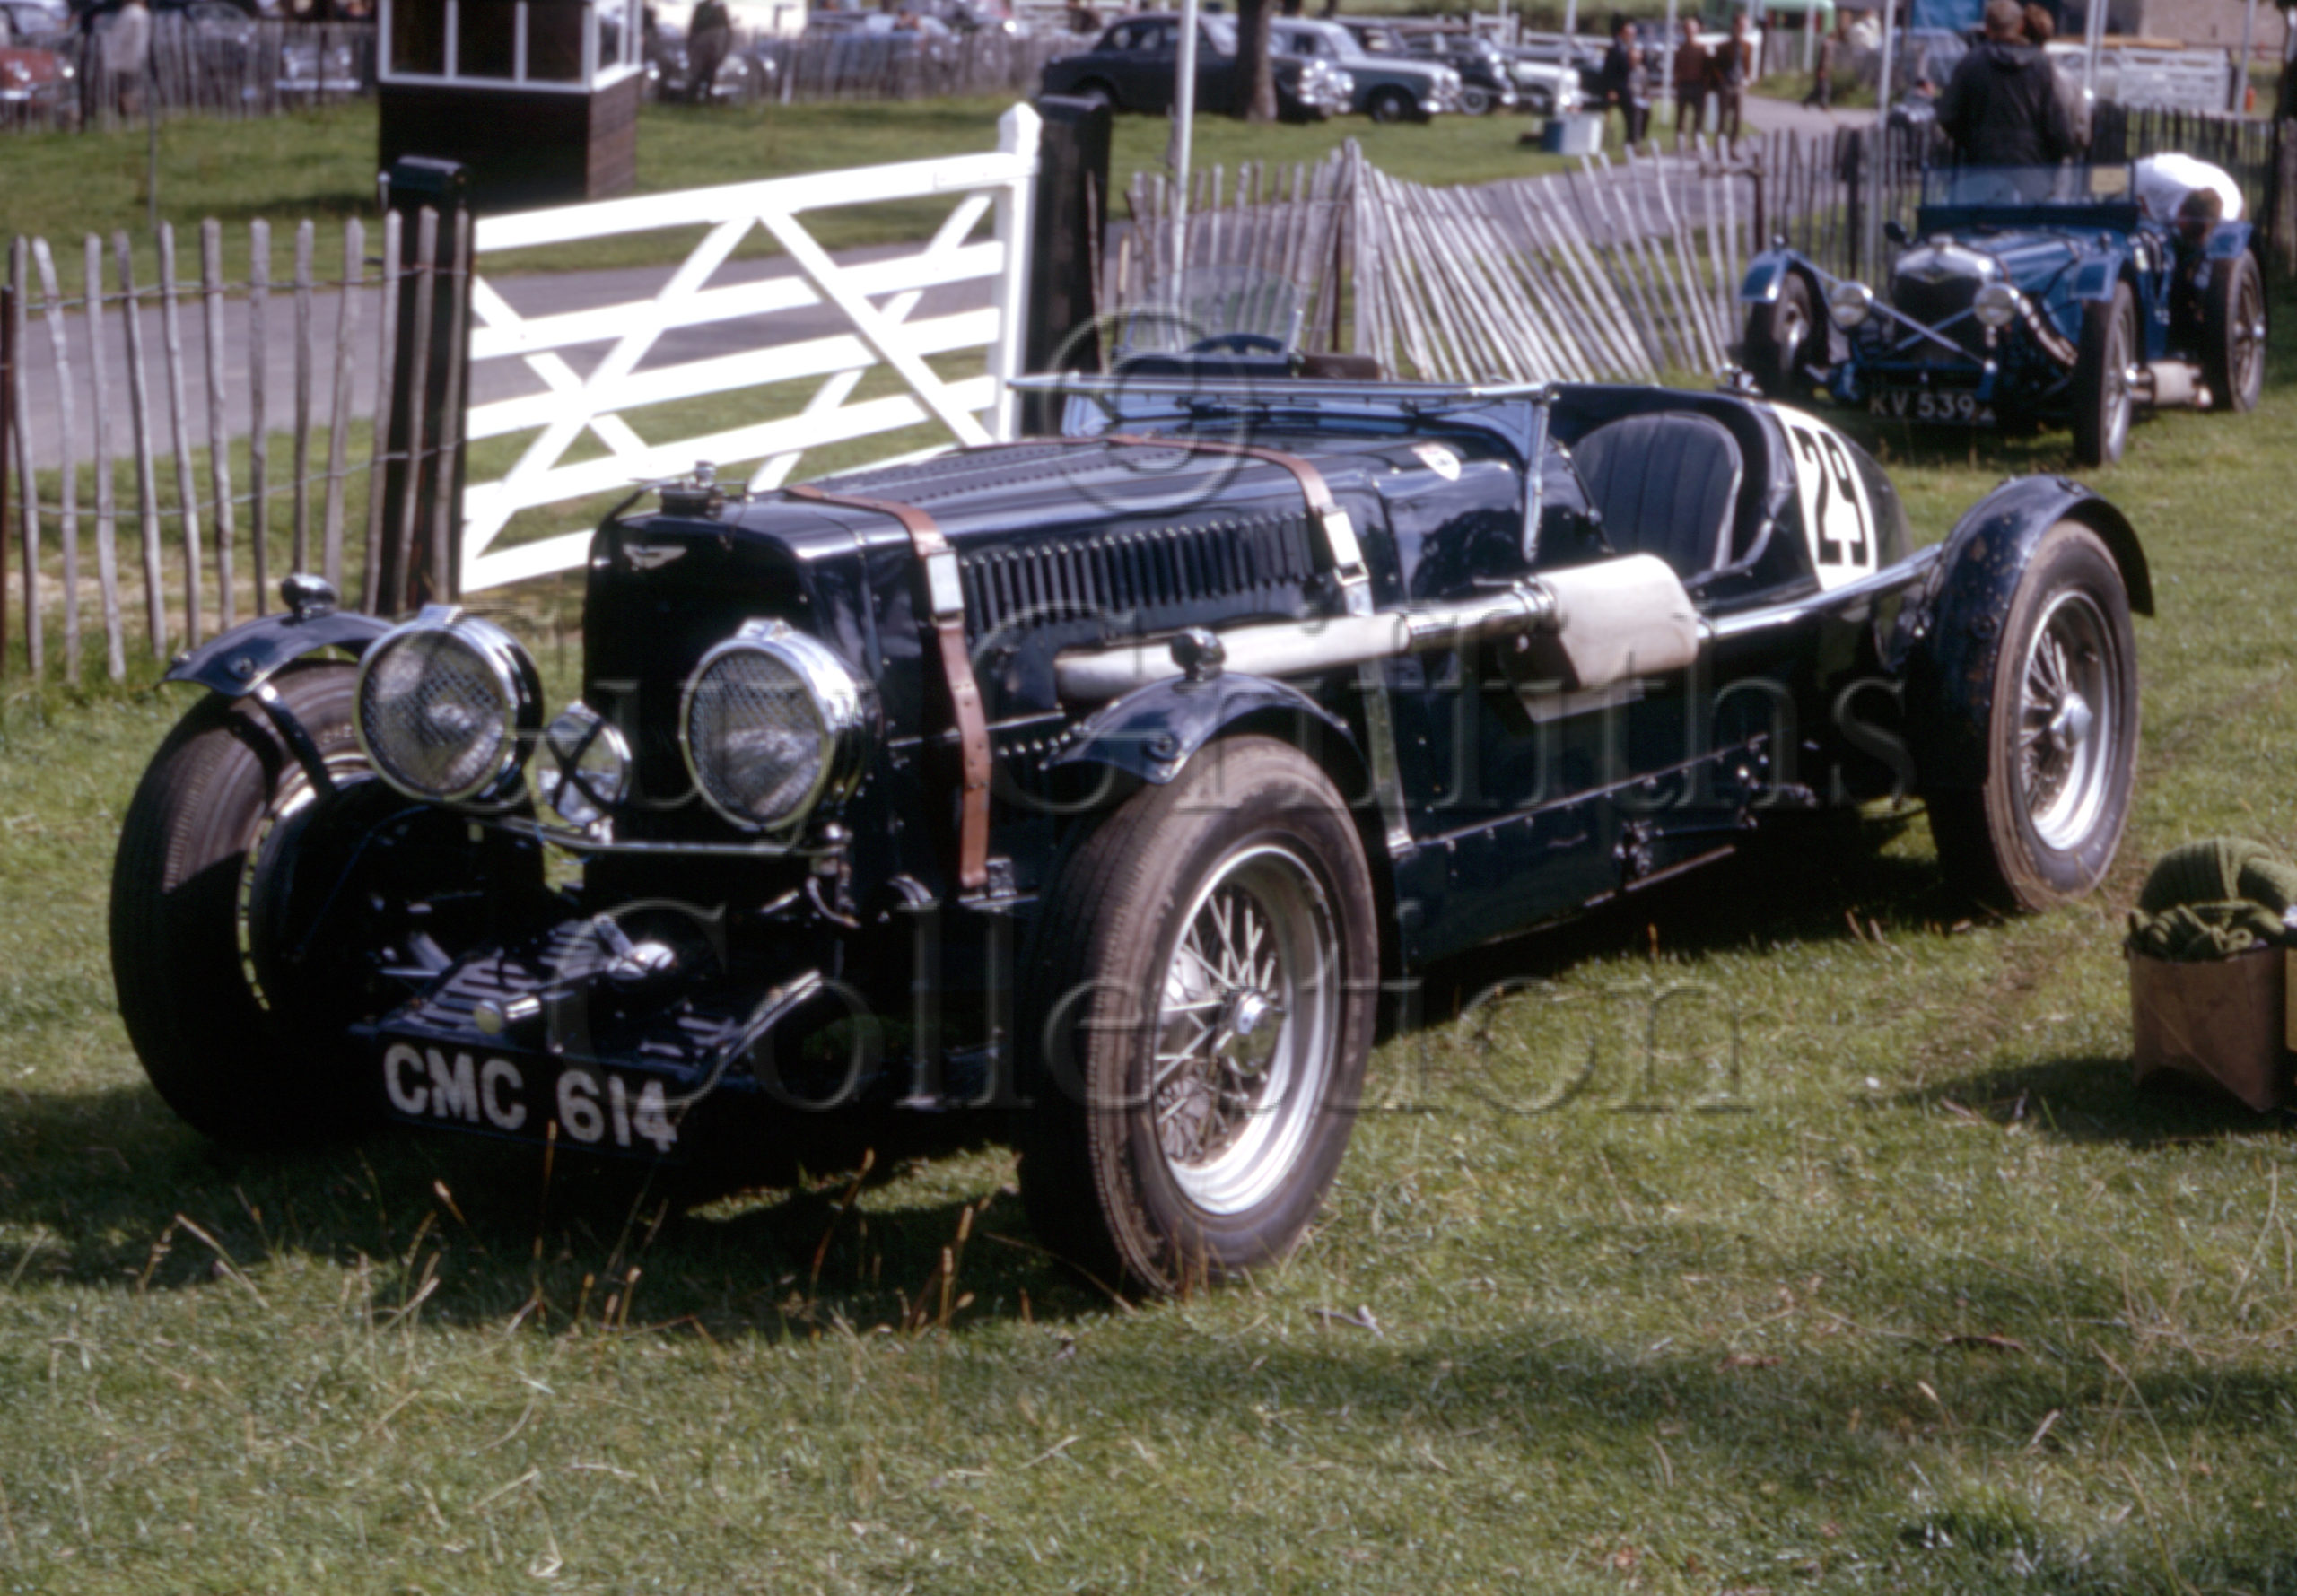 C-7-150–Aston-Martin-CMC-614–Prescott–18-10-1963.jpg - Guy Griffiths Collection